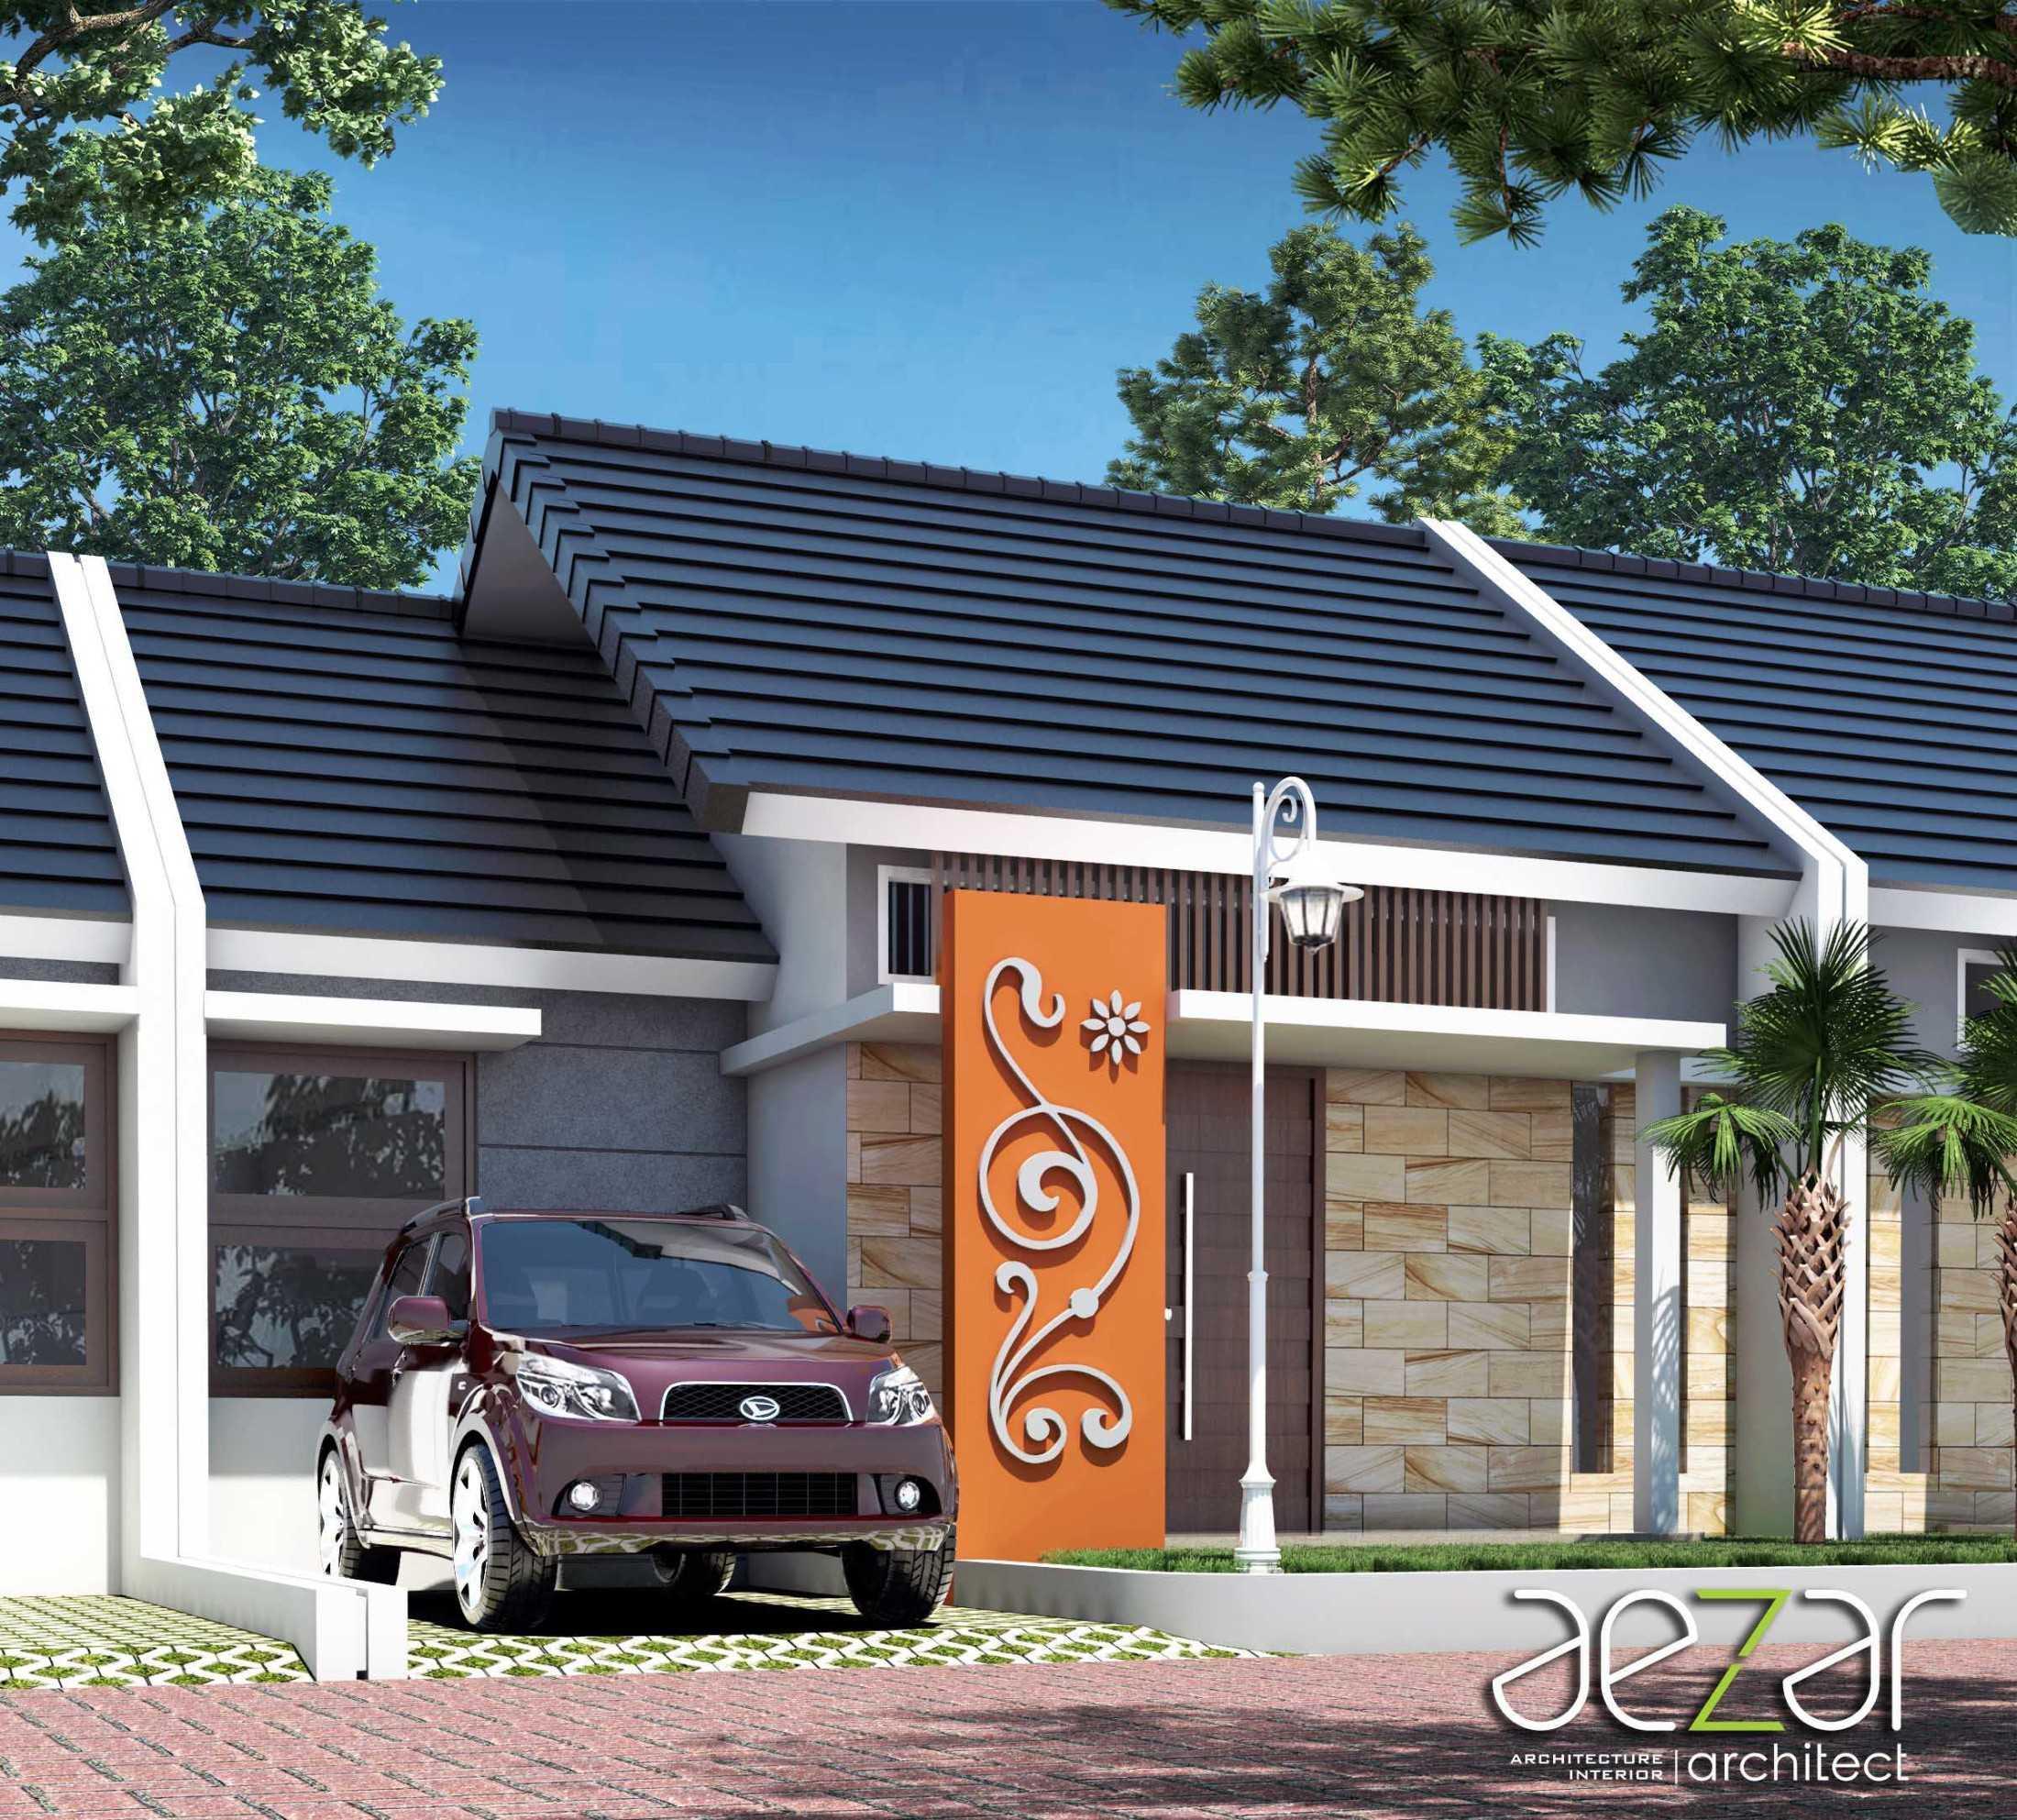 Aezar Architect Perumahan Villa Exist Sempurna Kabupaten Batang, Jawa Tengah, Indonesia Kabupaten Batang, Jawa Tengah, Indonesia Exterior View Minimalis 54484